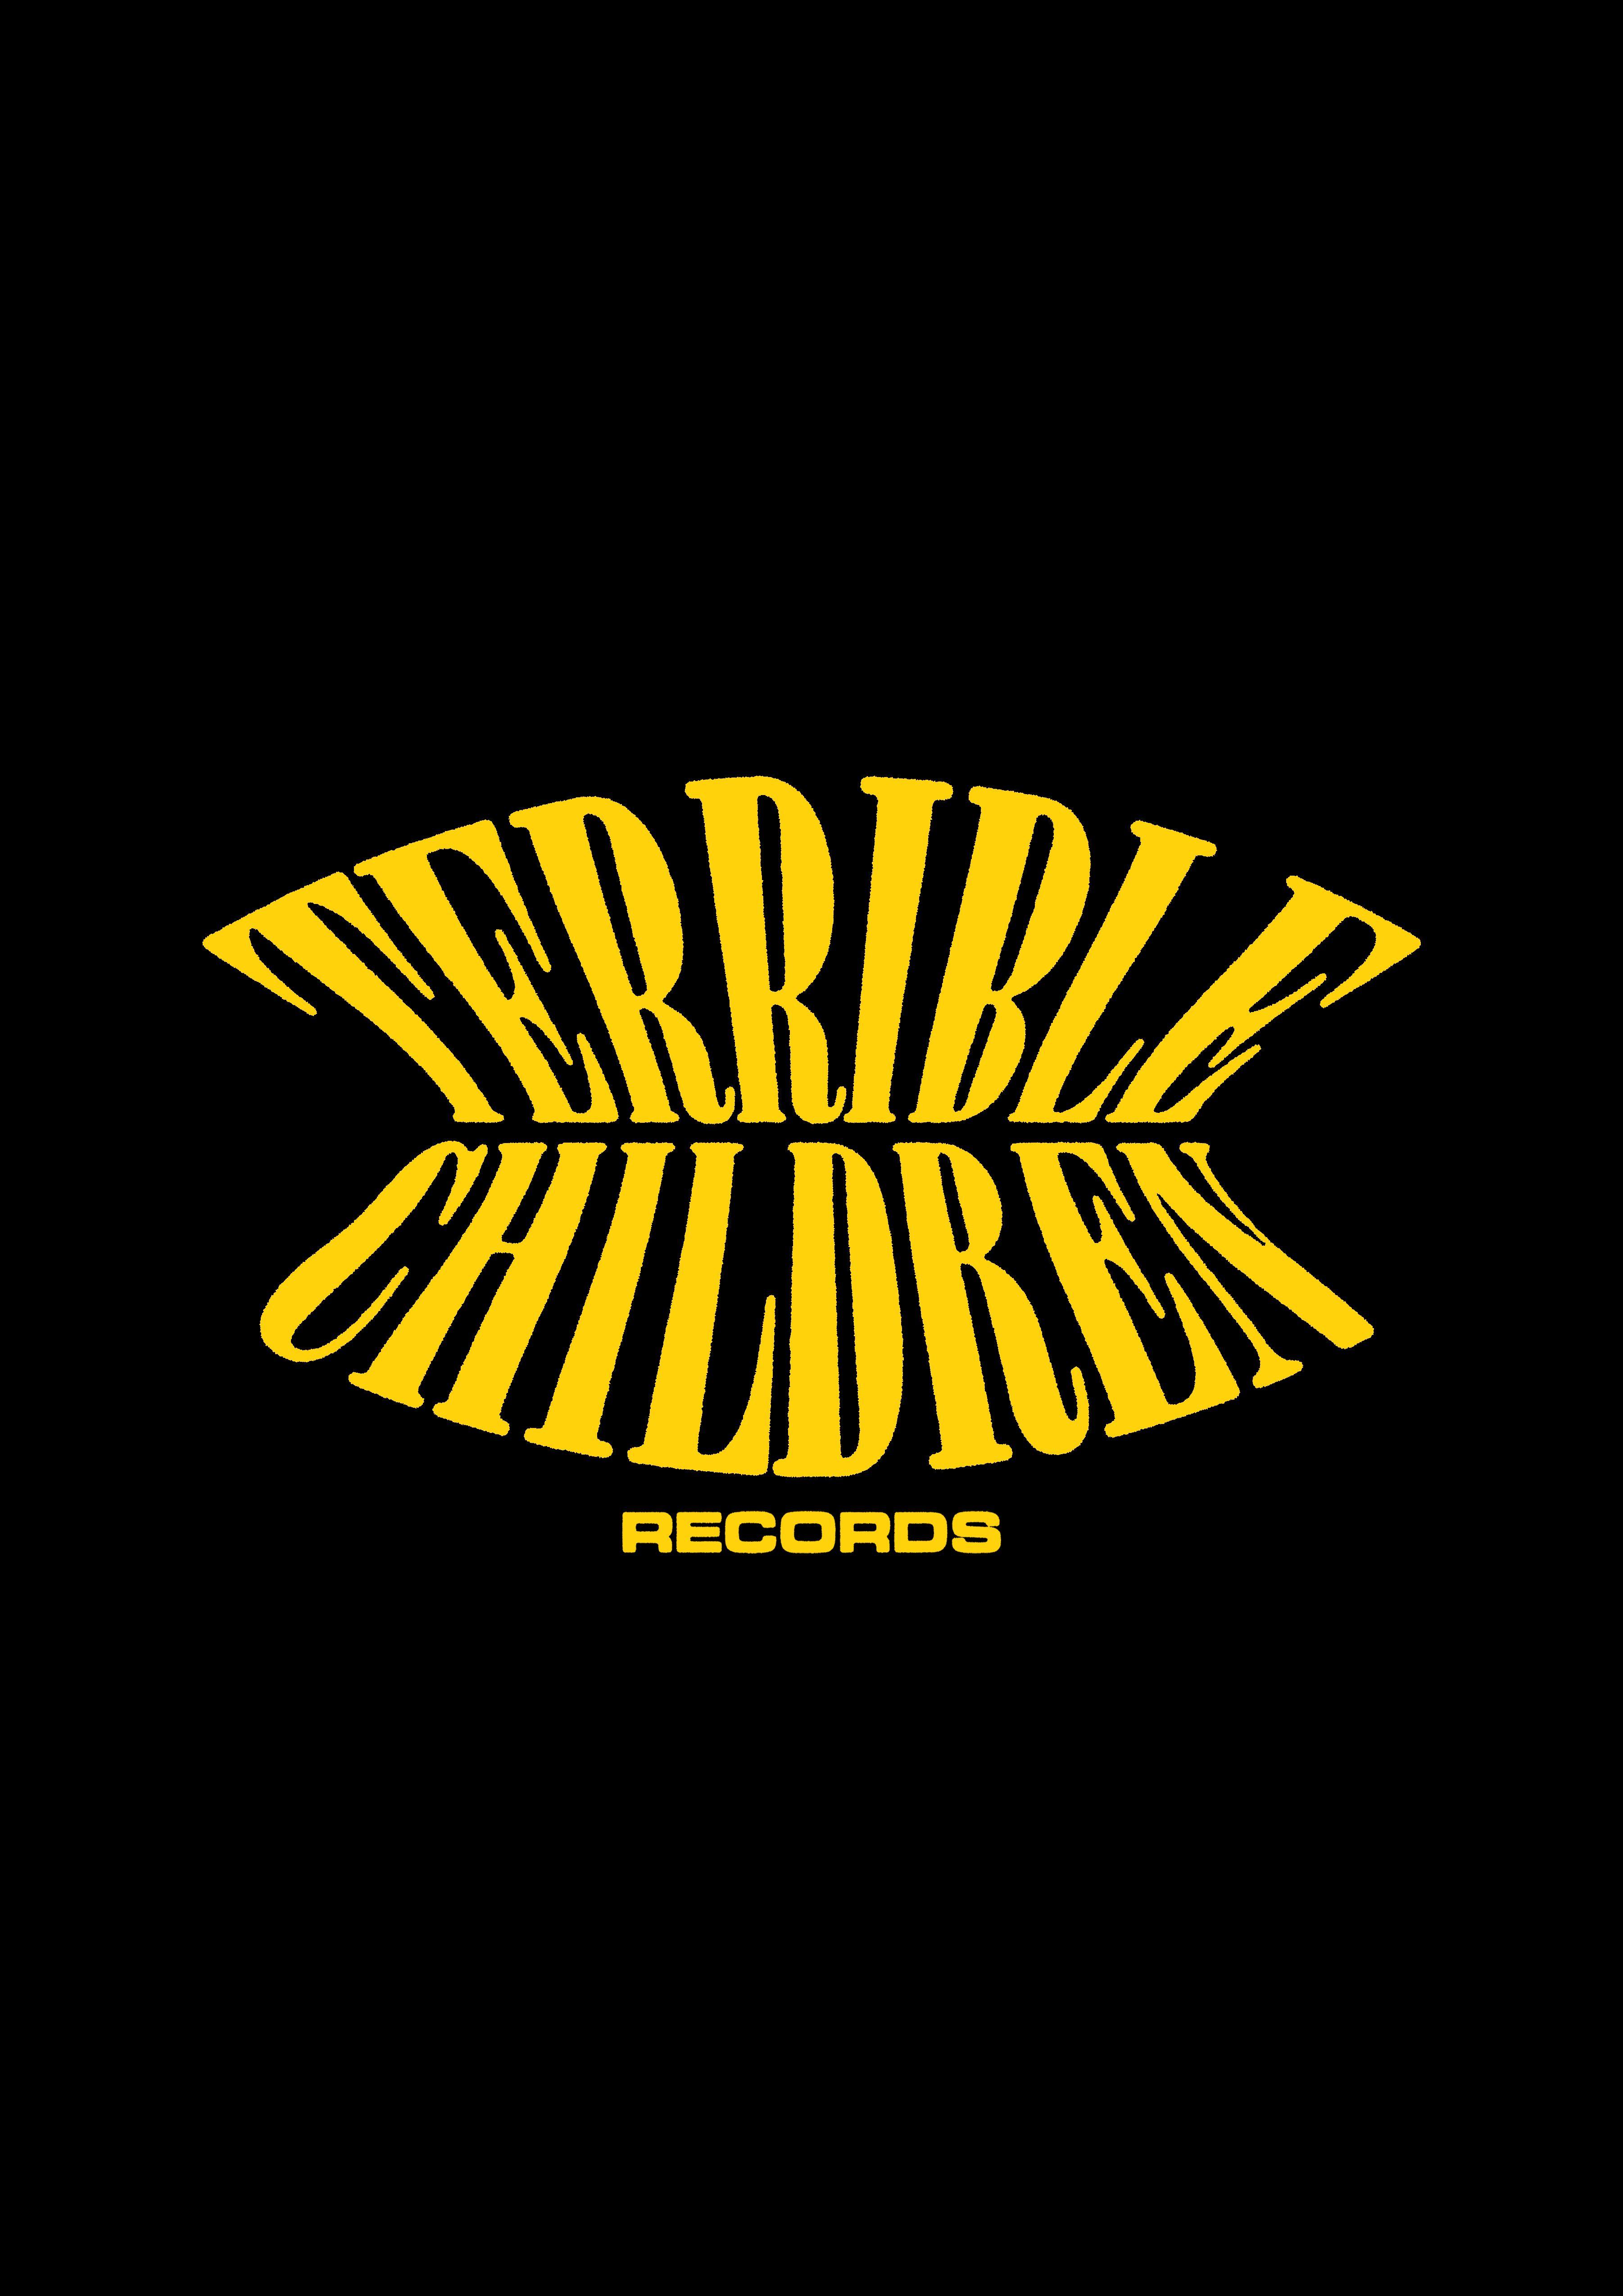 Terrible Children Records